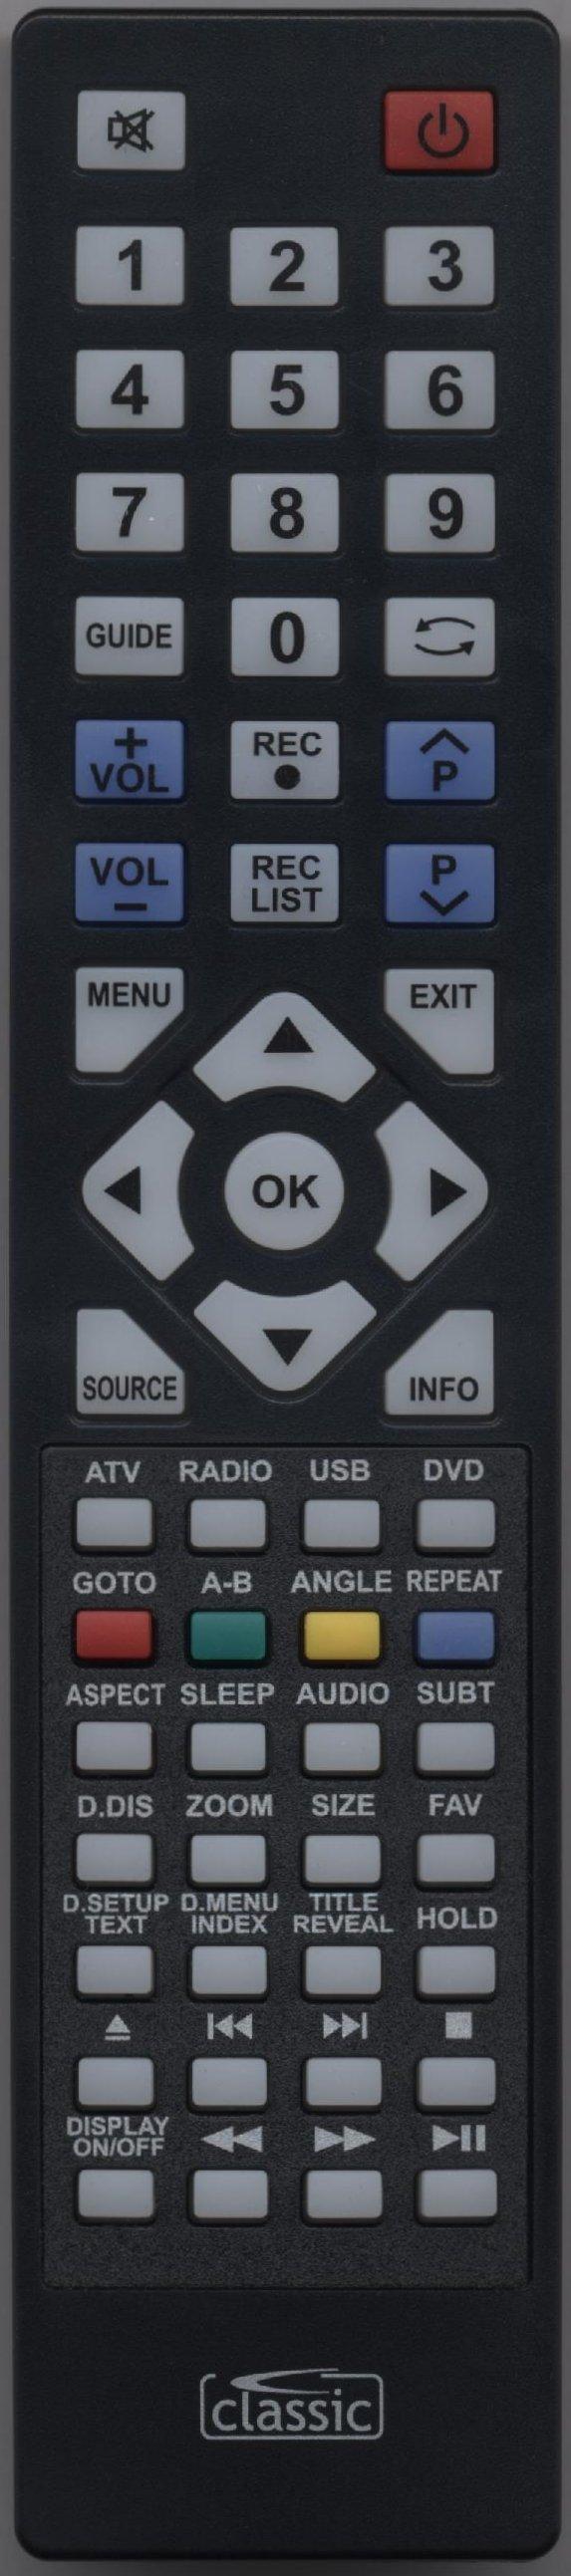 BLAUPUNKT 215/54G-GB-1B-FTCDU-UK  Remote Control